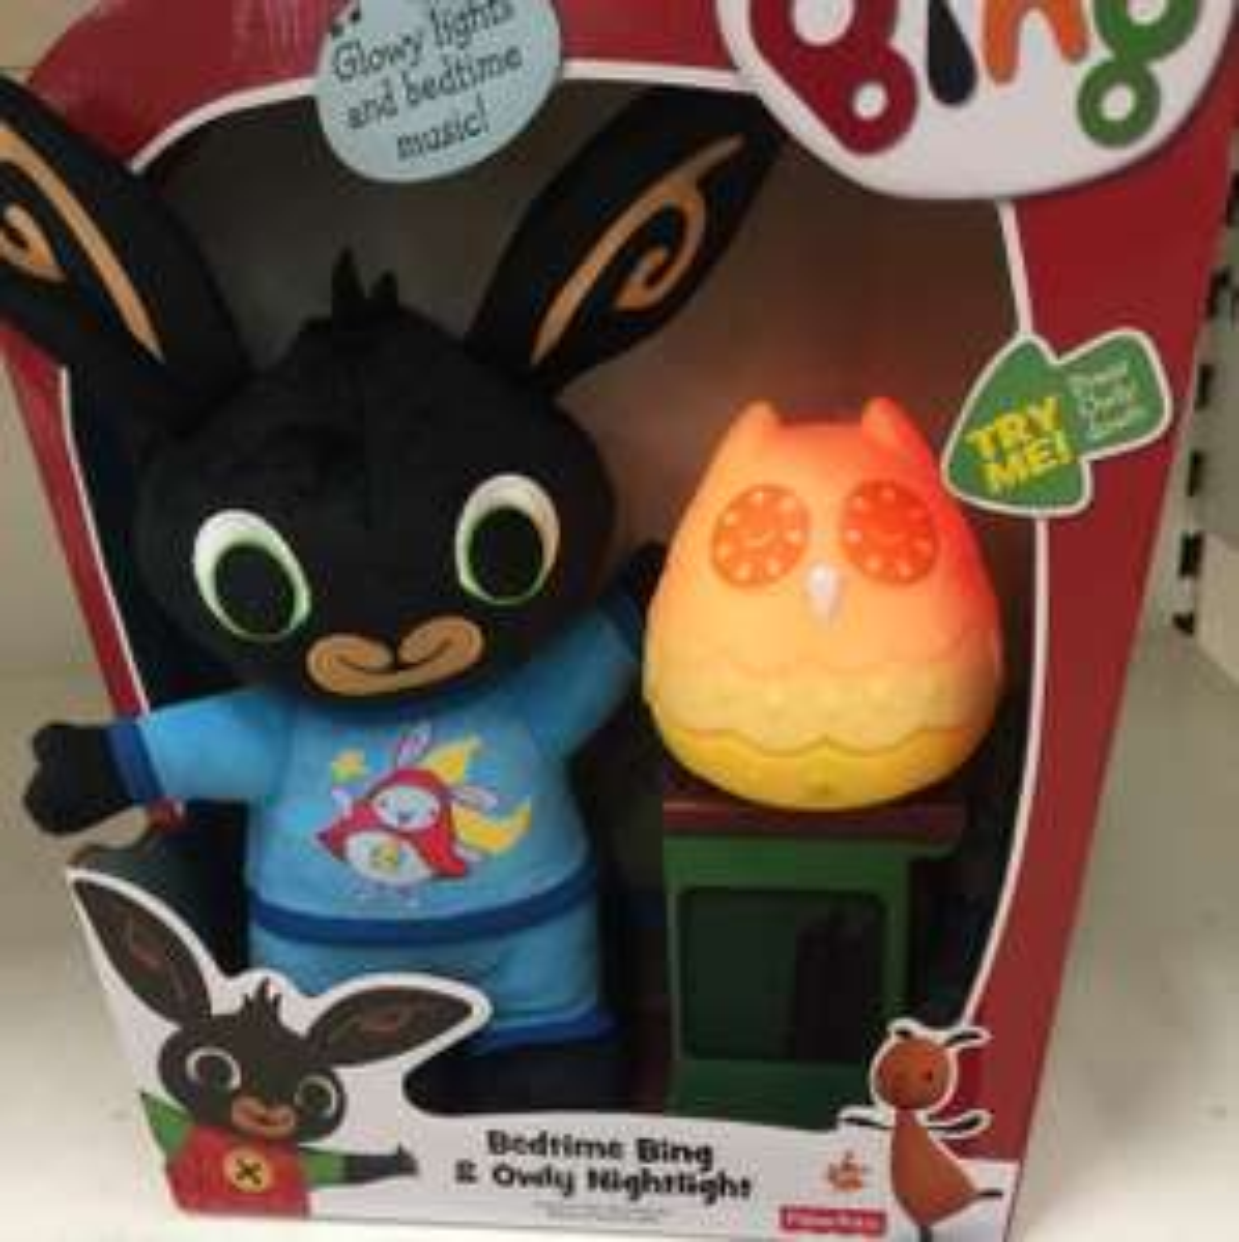 Bing bedtime bing and owly night light £14 @ Tesco St. Helens Ravenhead